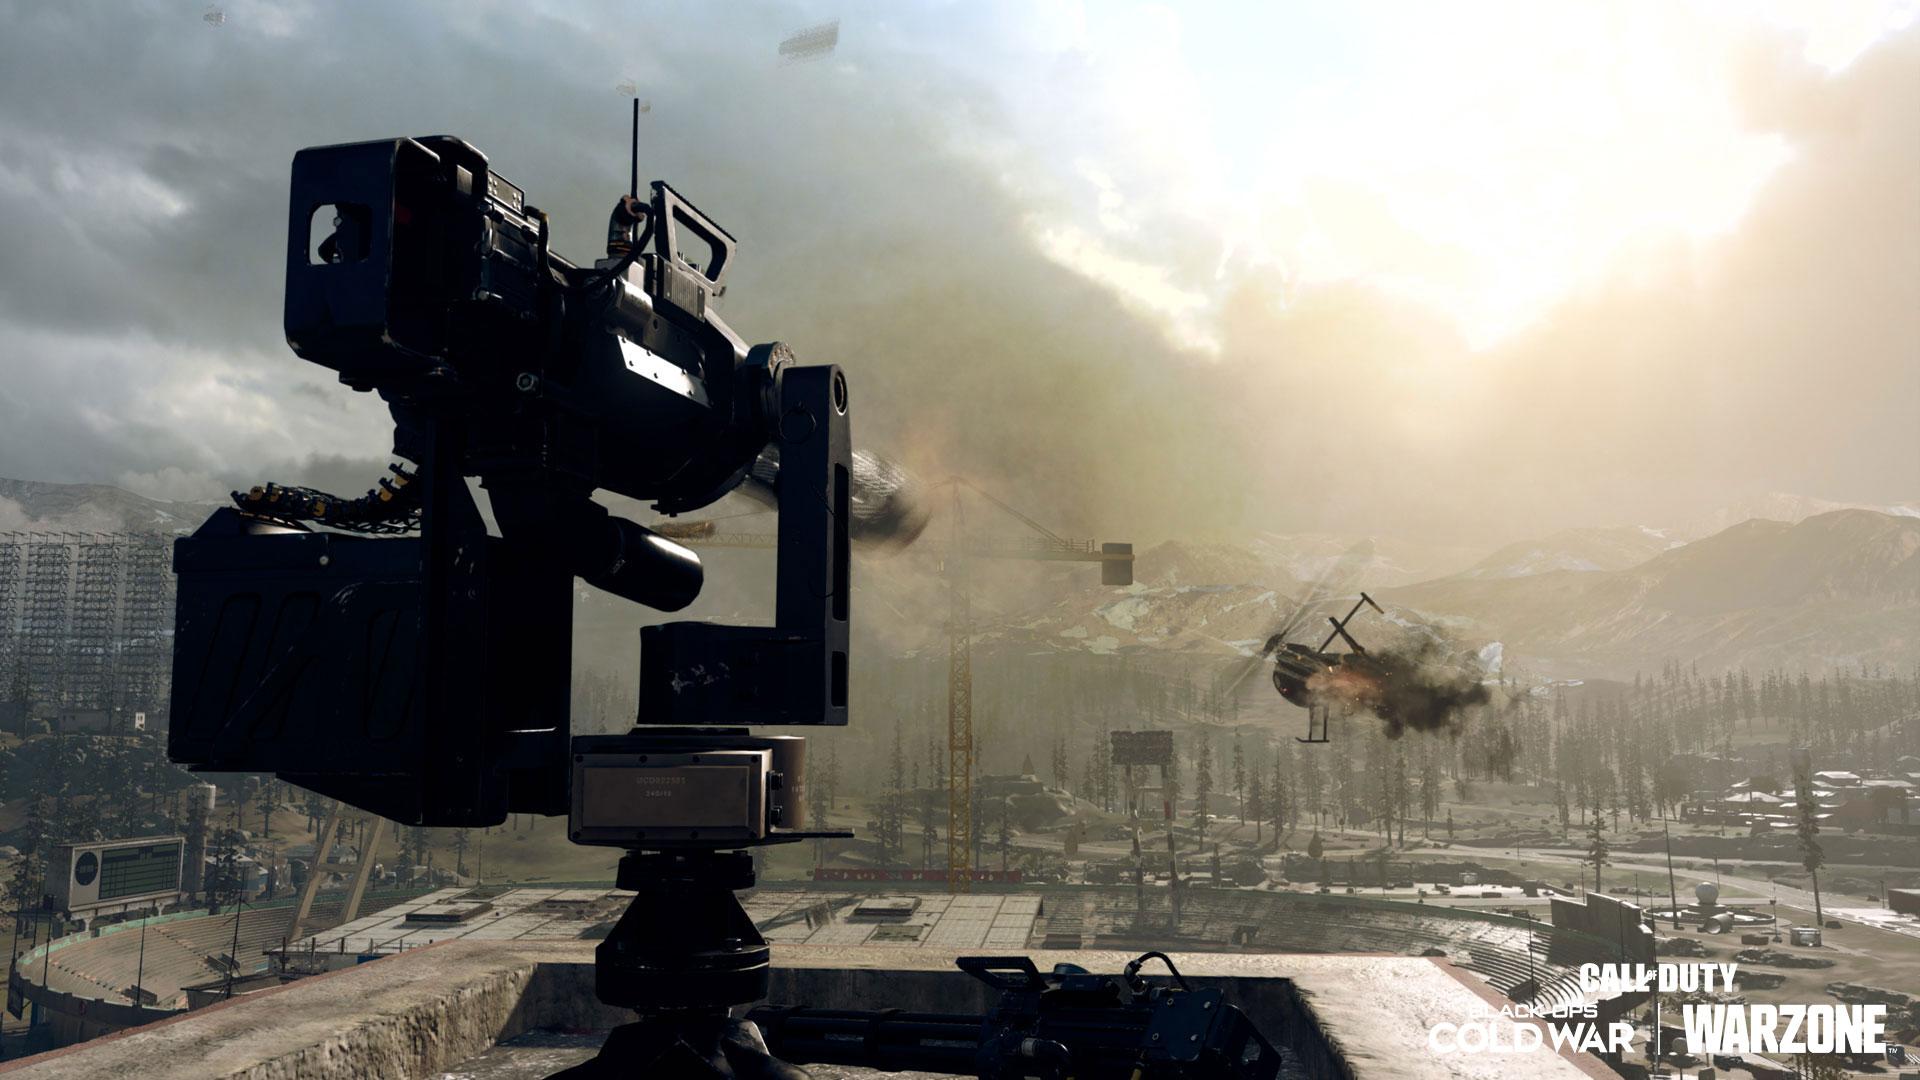 Geschütz schießt einen Helikopter ab